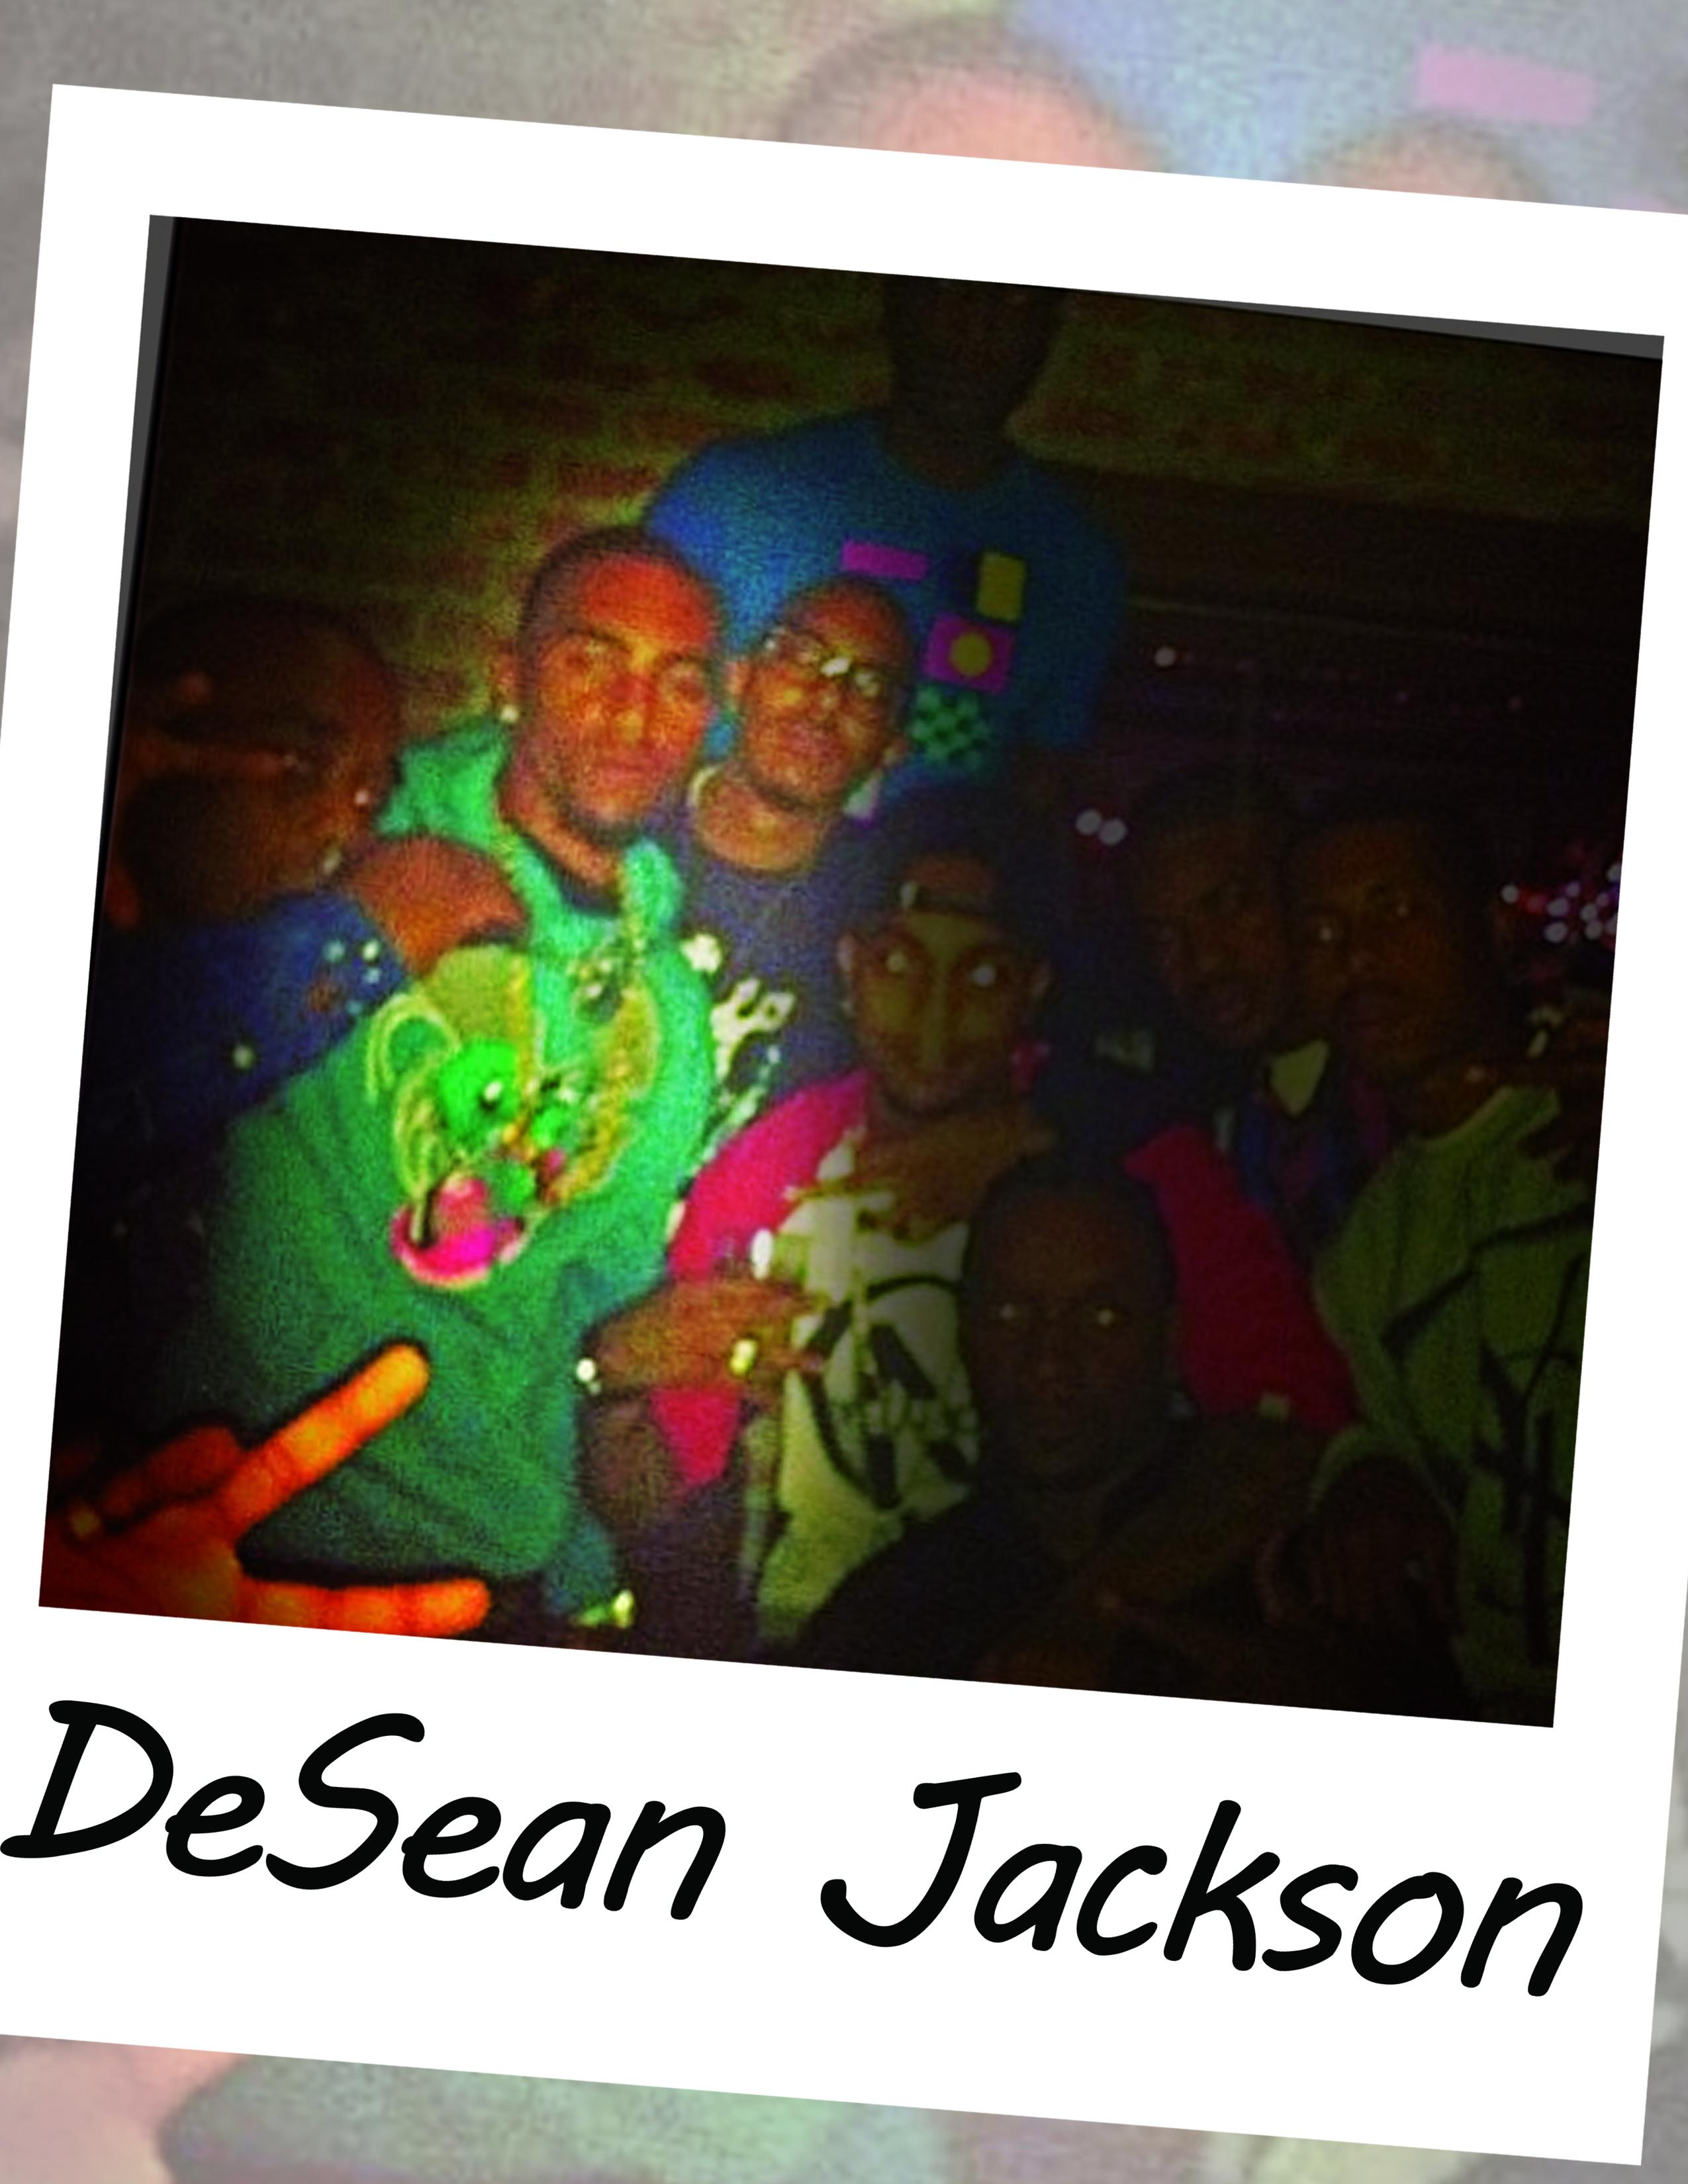 DeSean Jackson (NFL)